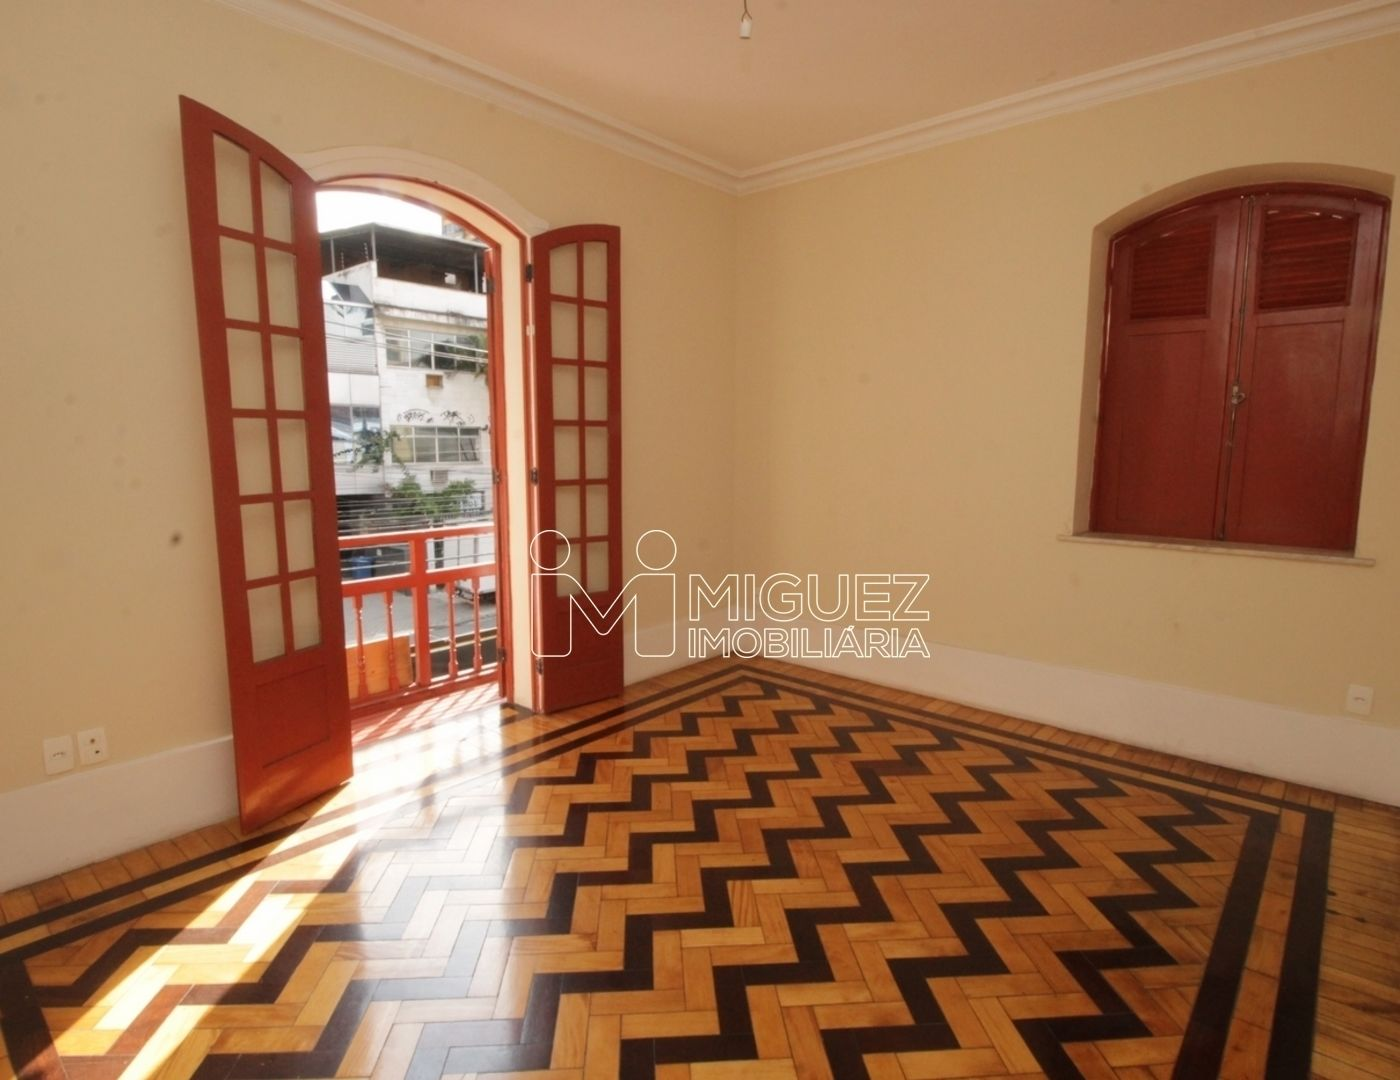 Casa, venda, Rua Professor Gabiso - Tijuca , Rio de janeiro